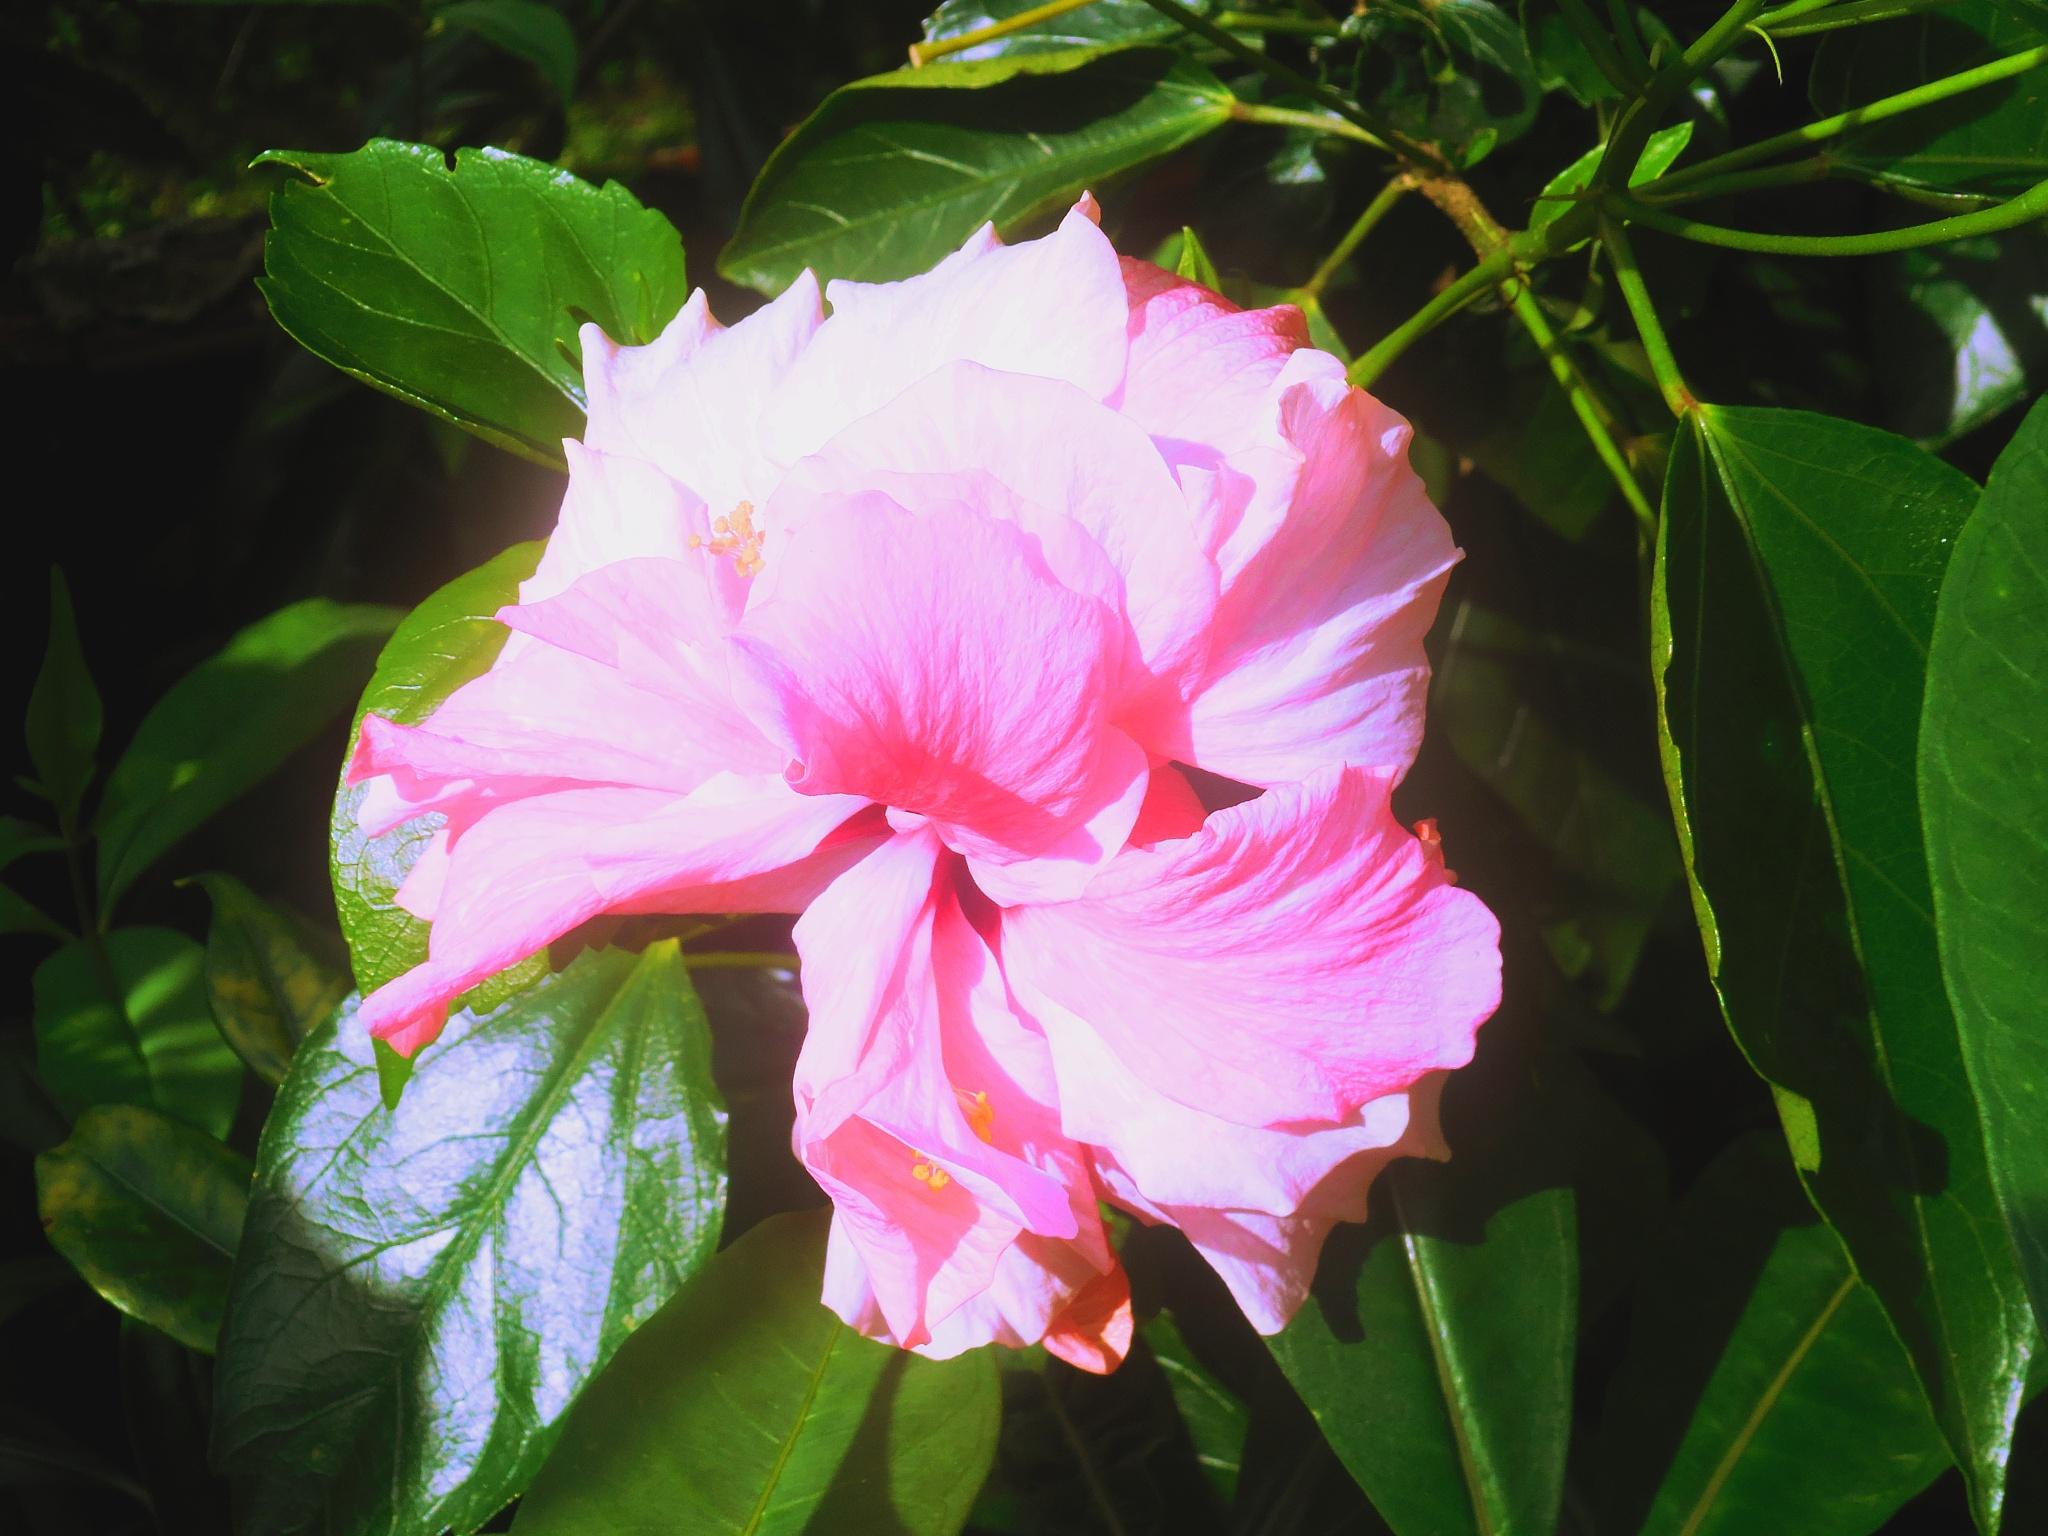 Bonita Flor by Elmer Leach